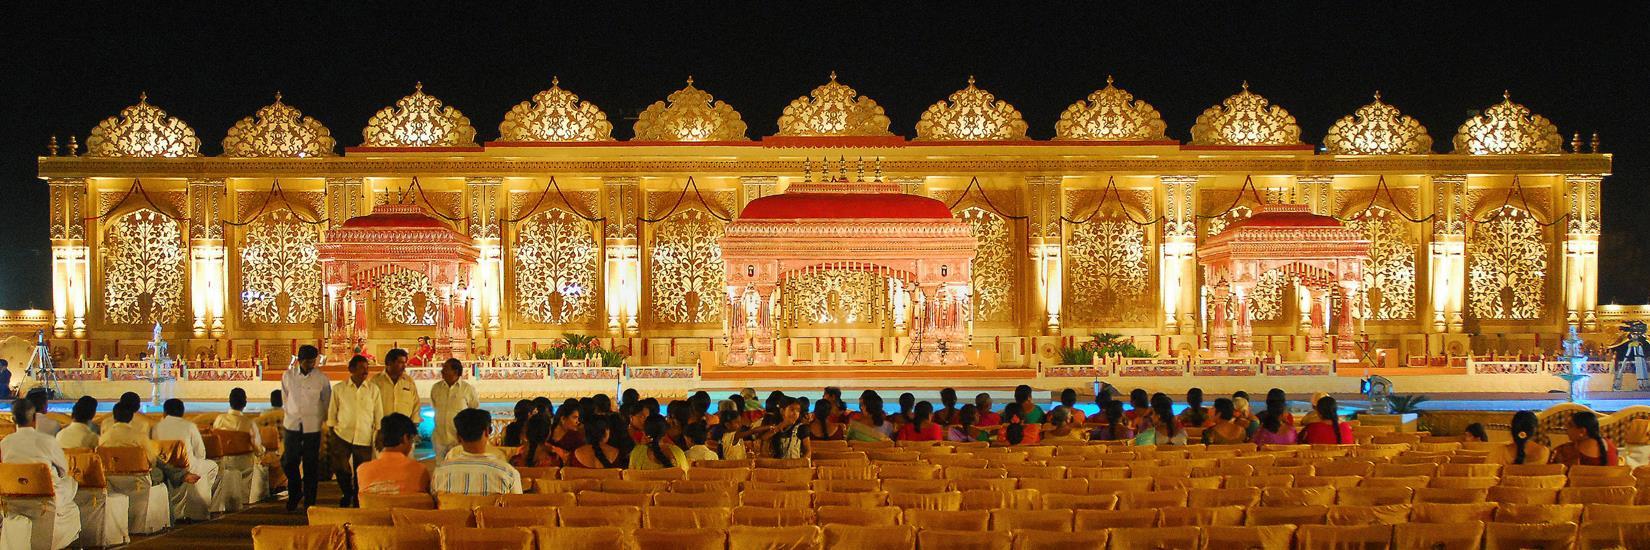 Best Stage Decorator In Coimbatore, BestWedding Decorator In Coimbatore, Event Organiser In Coimbatore, Best Baloon Decorator In Coimbatore - by SRI DIVYA DECORATOR & SOUND SERVICE, Coimbatore